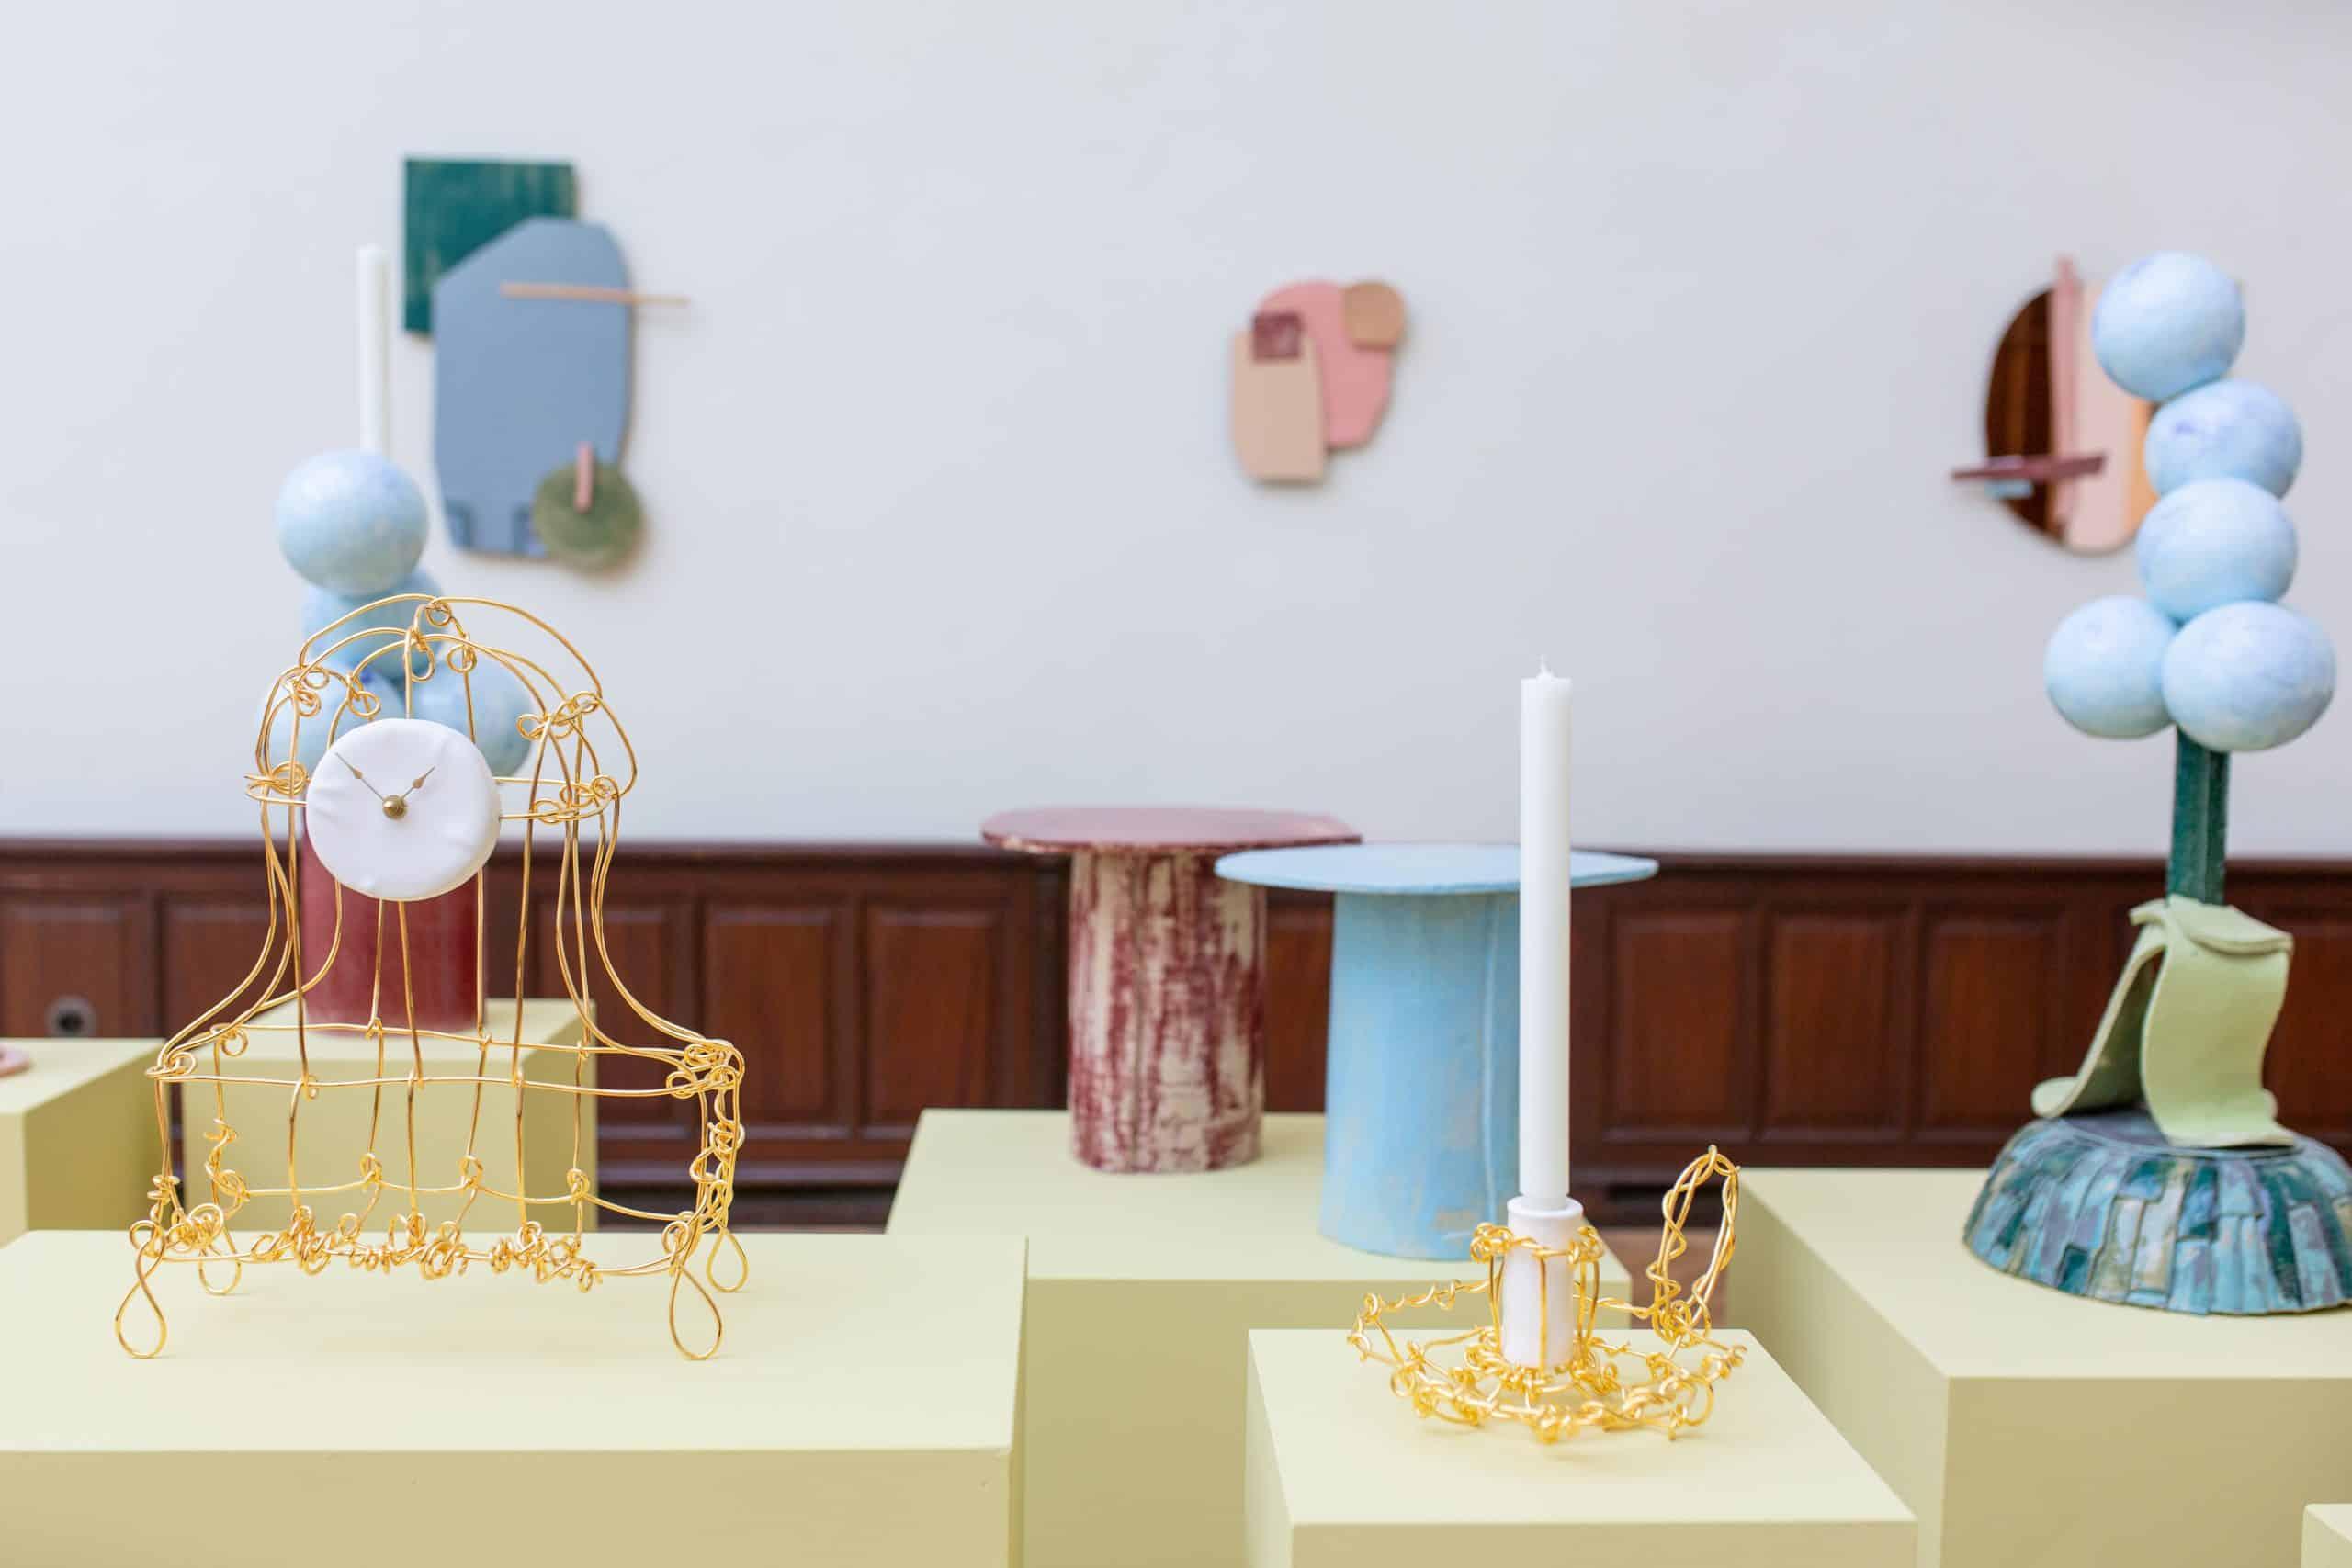 New pieces by Dutch designer KIKI VAN EIJK are presented by SPAZIO NOBILE at the Lempertz action house.